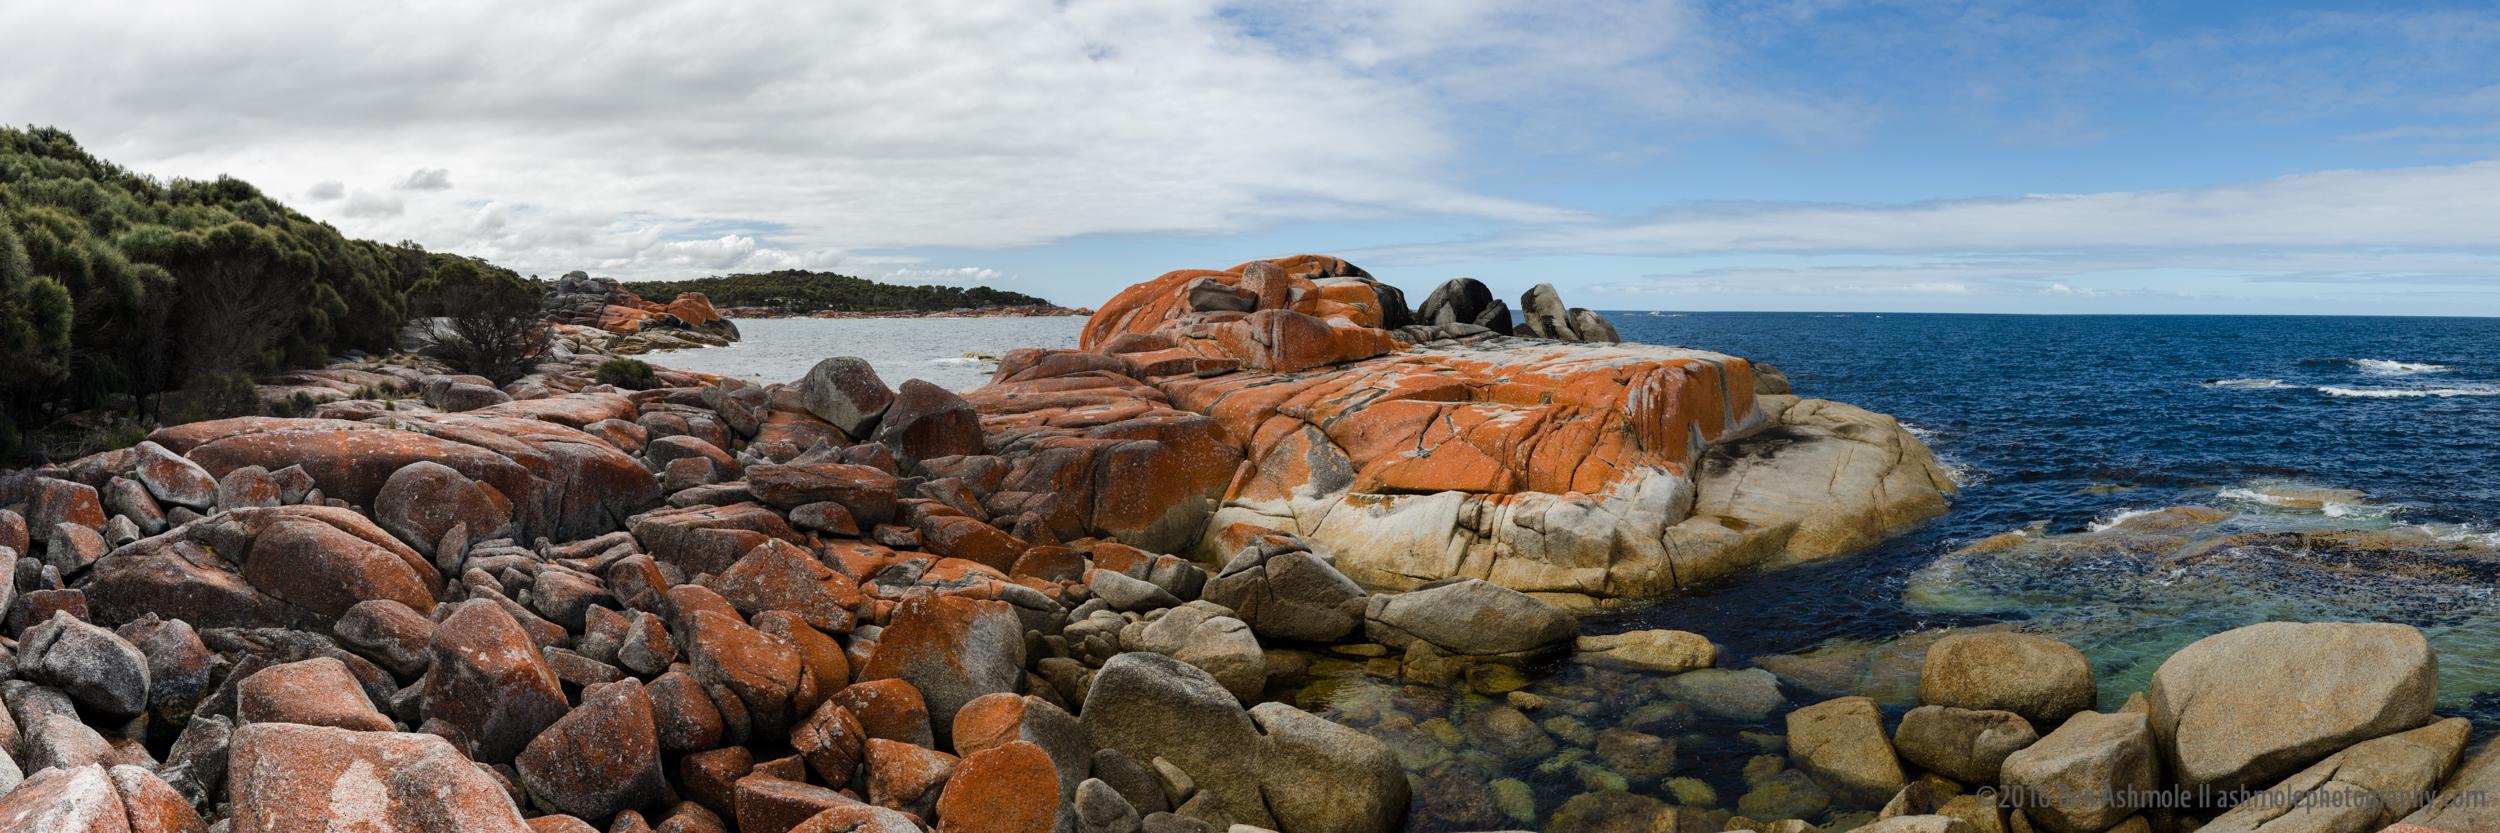 Bay Of Fires Panorama, Tasmania, Australia